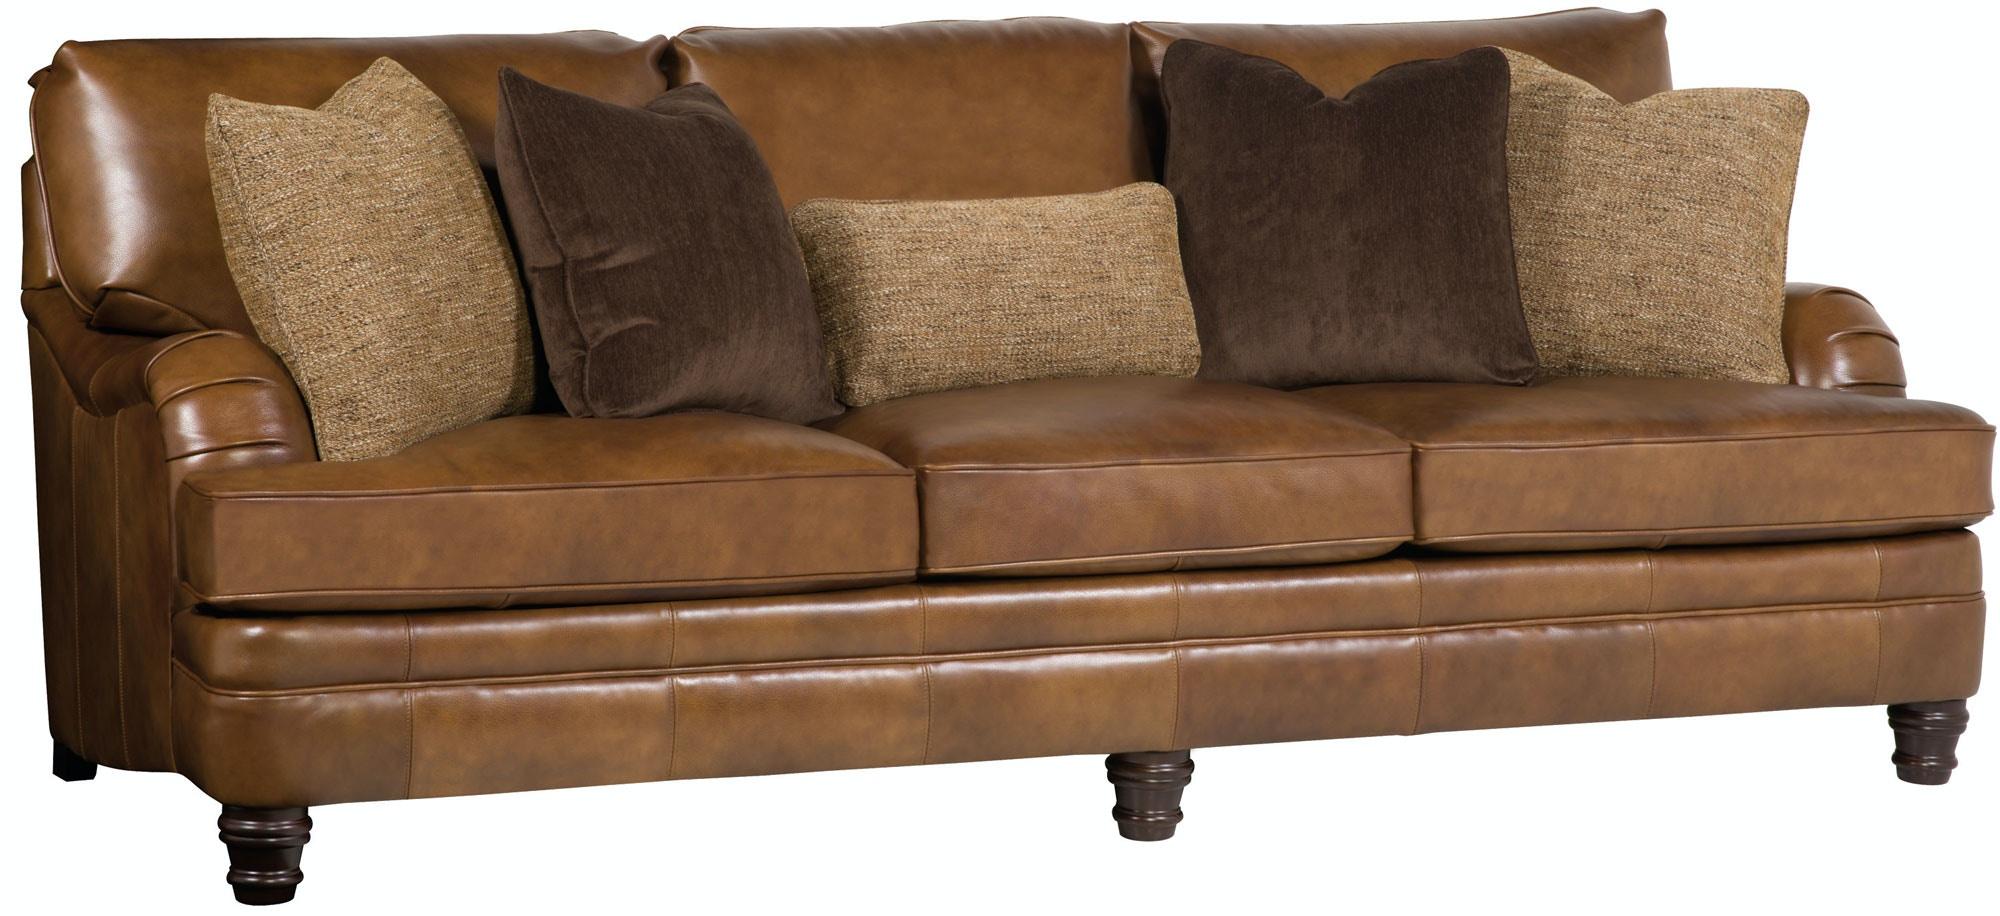 Bernhardt Furniture Tarleton Sofa 7077L